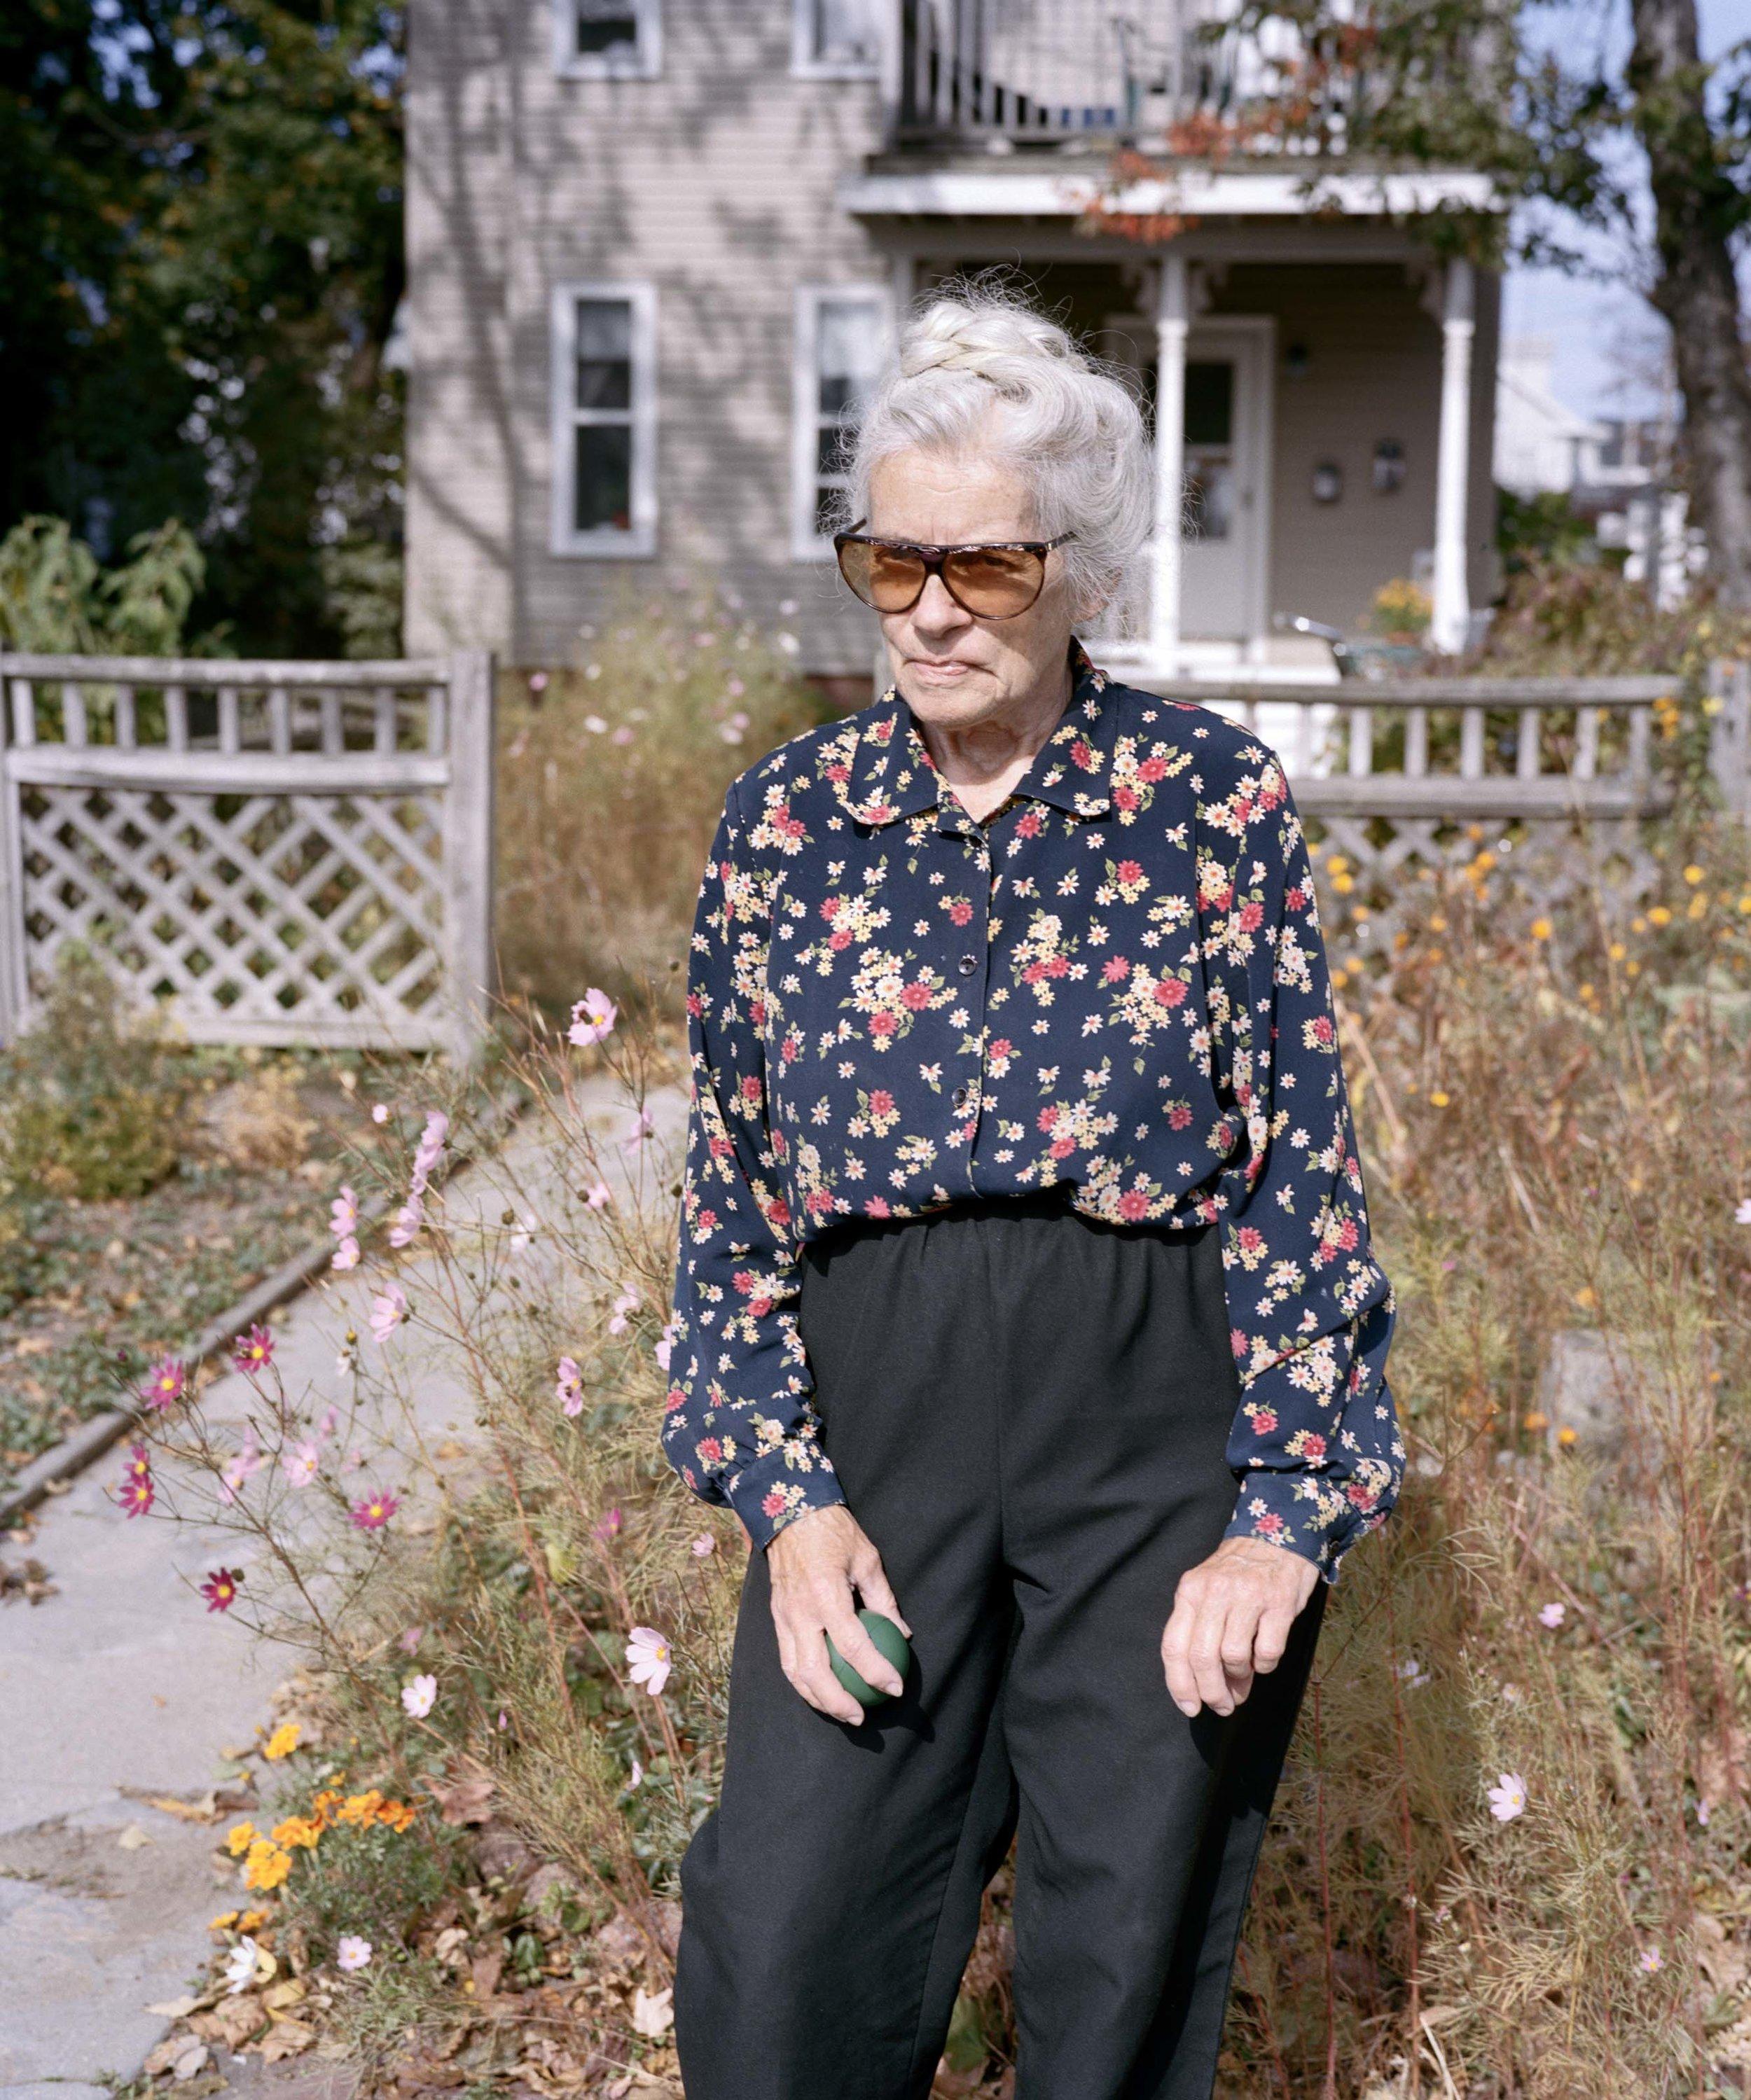 Judy, near Boston, MA, 2013